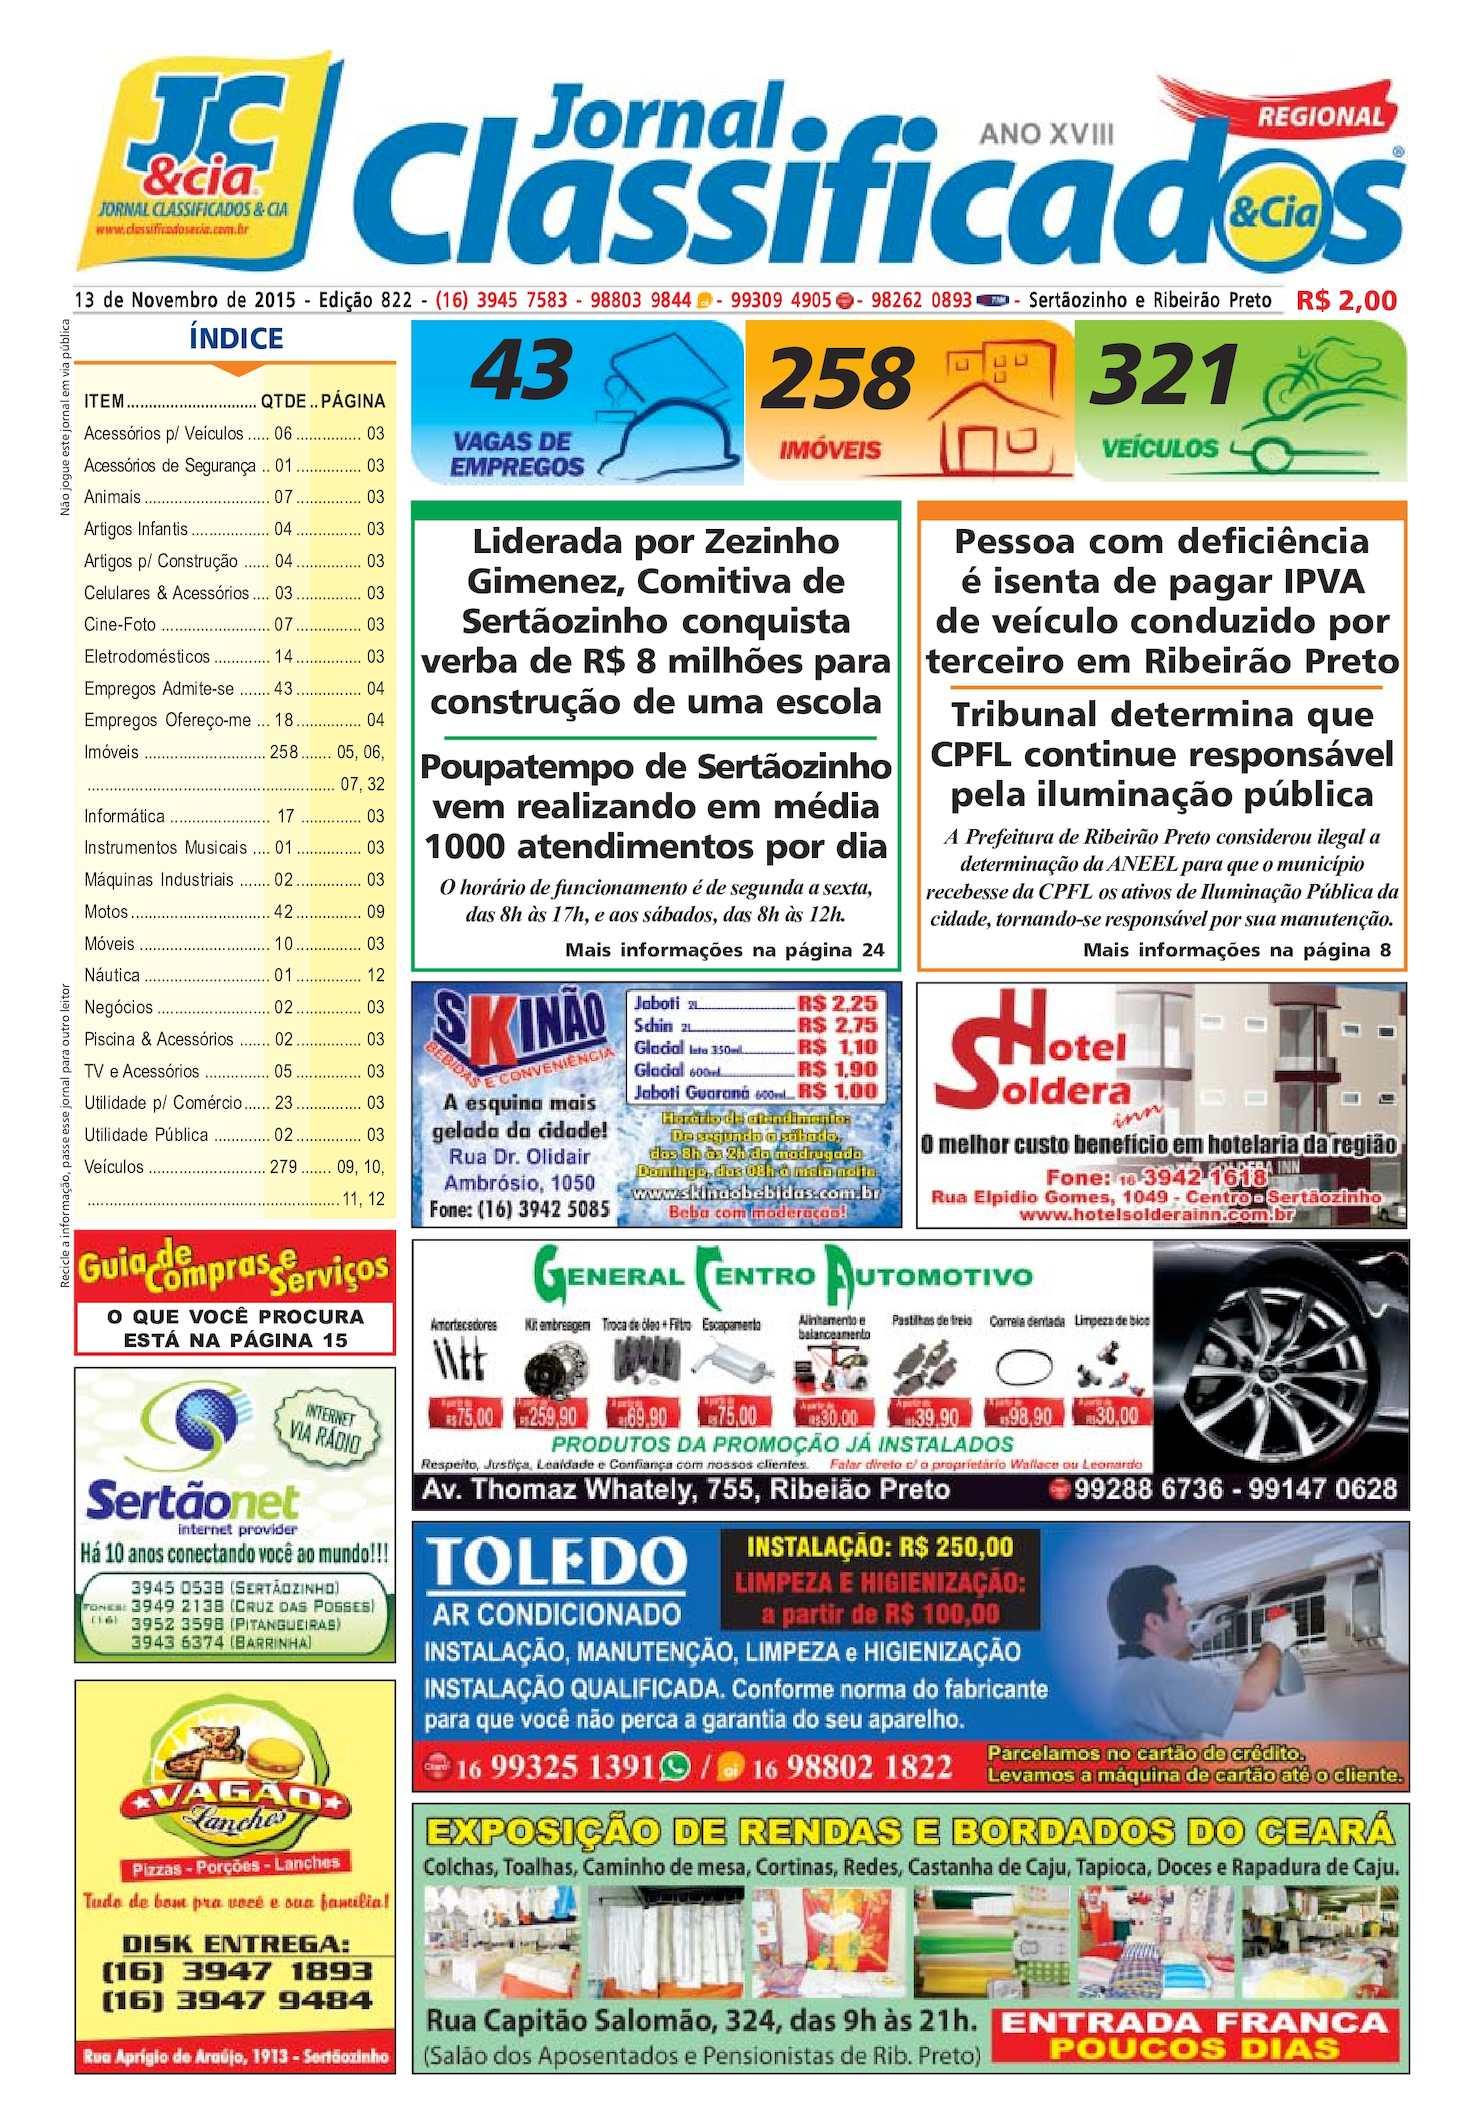 Calaméo - Regional 822 f0fc45c54a